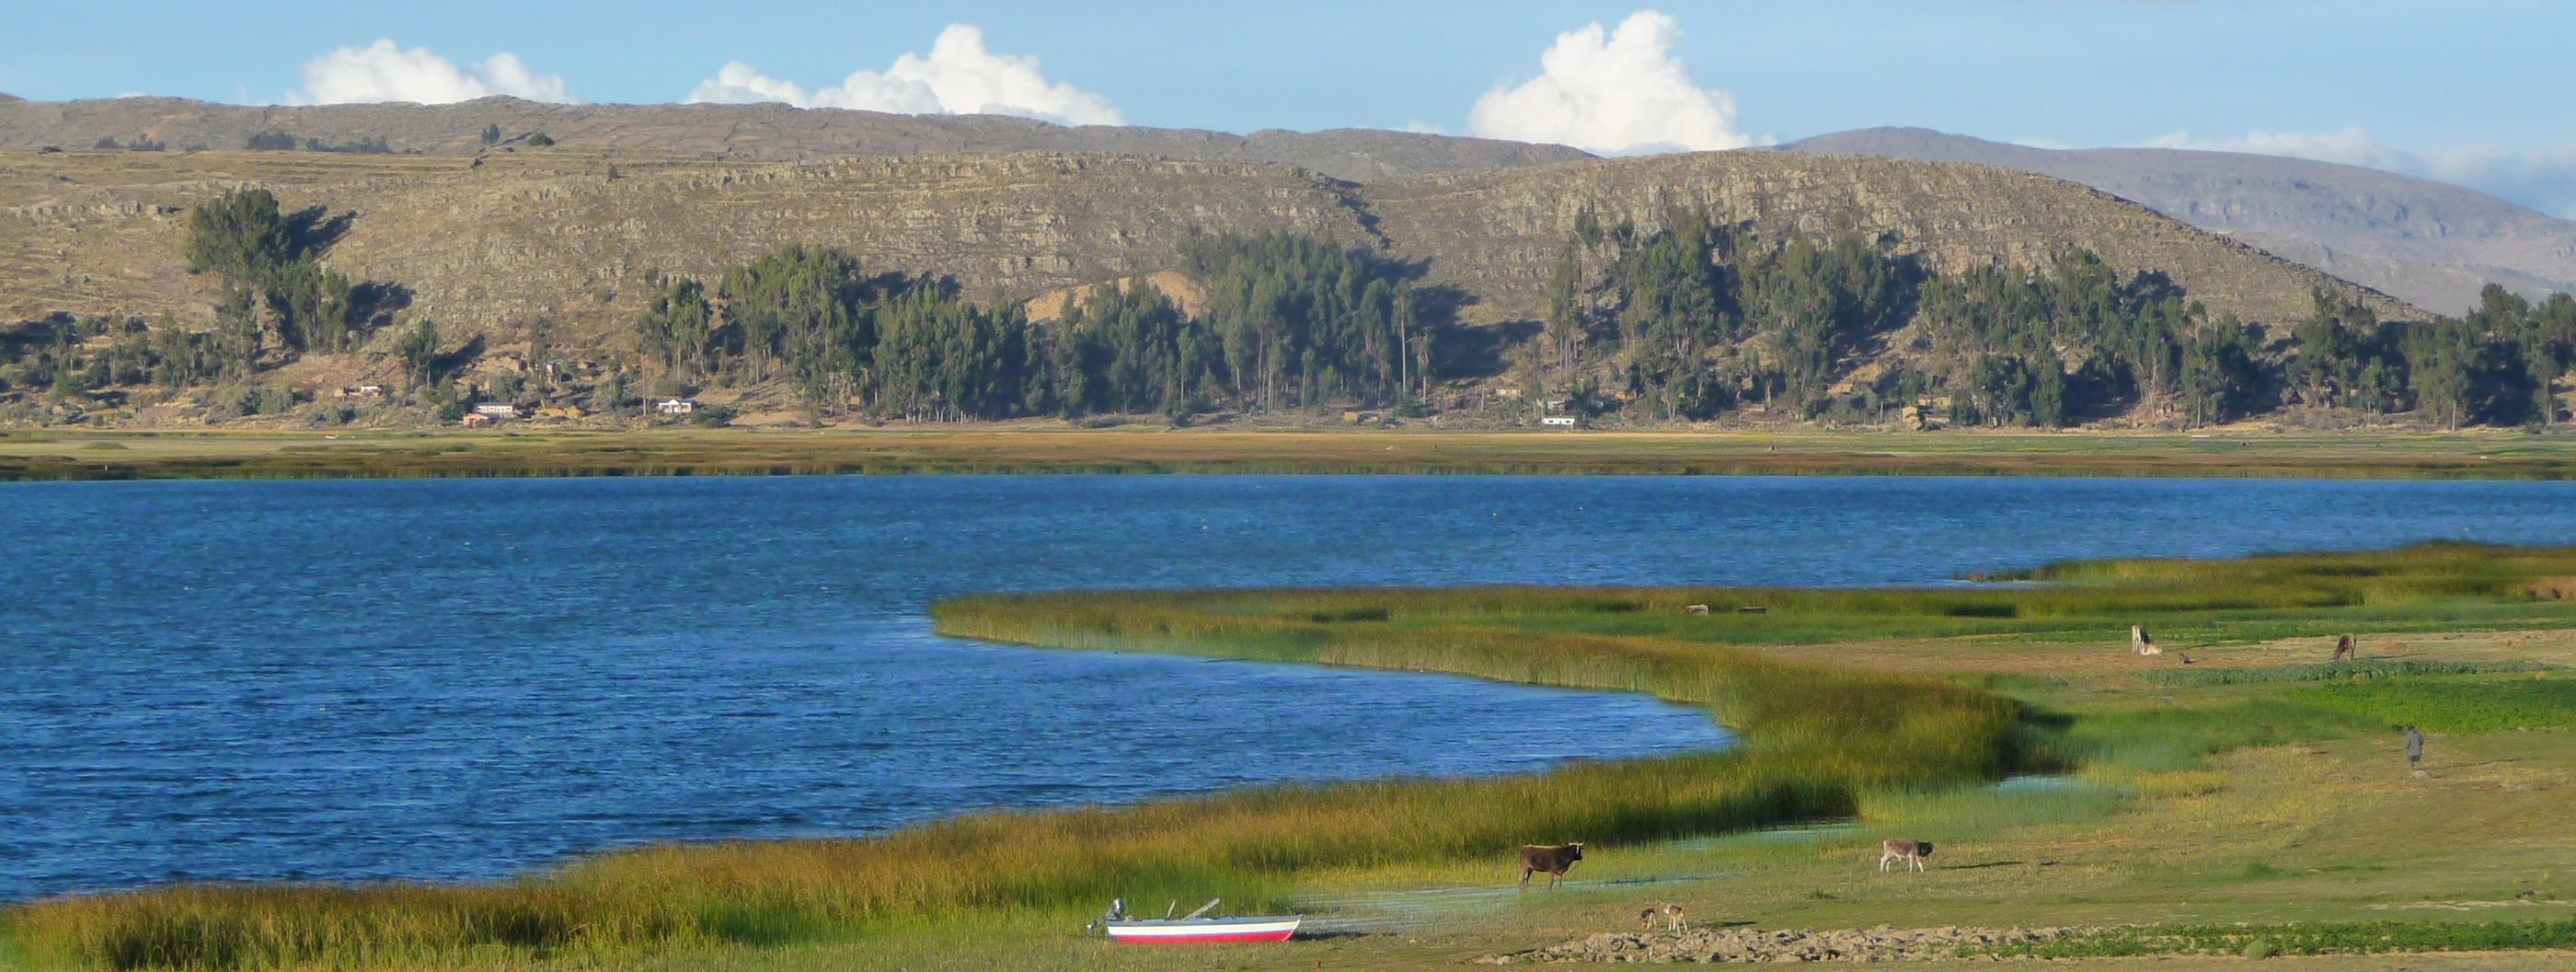 Challapata Peninsula